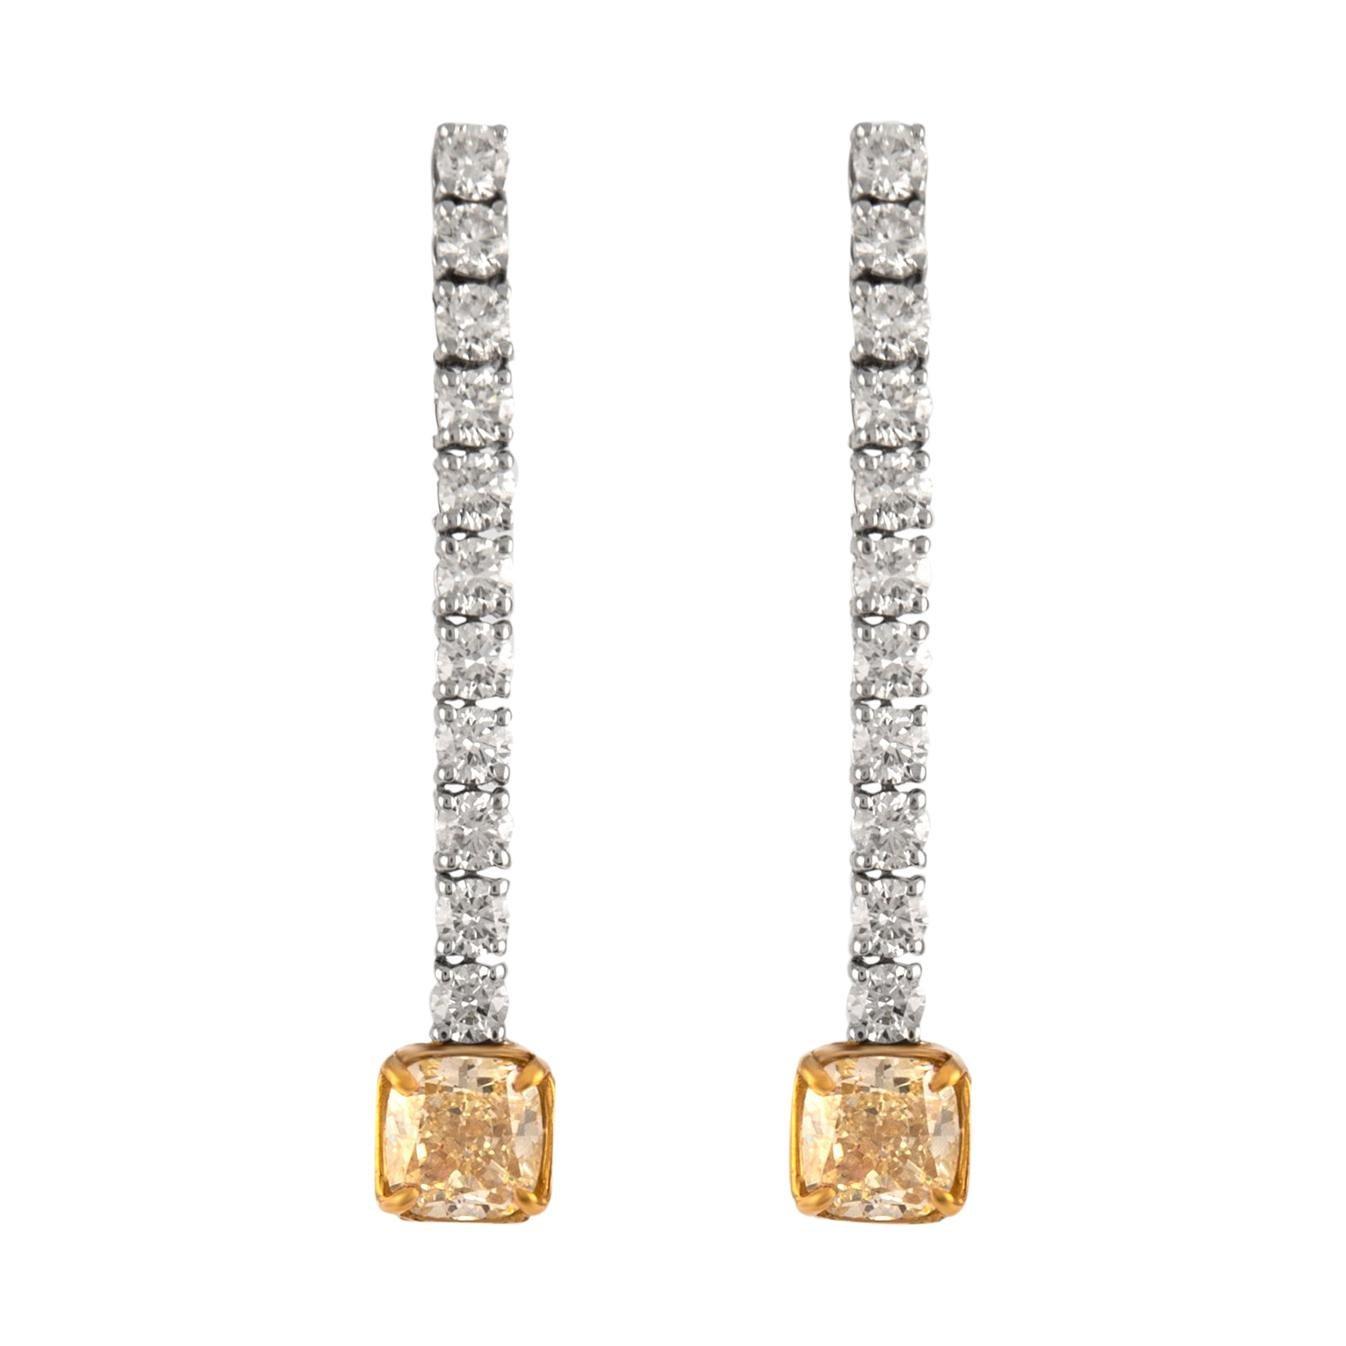 GIA Certified 5.20ct Total Diamond Drop Earrings 18k White & Yellow Gold